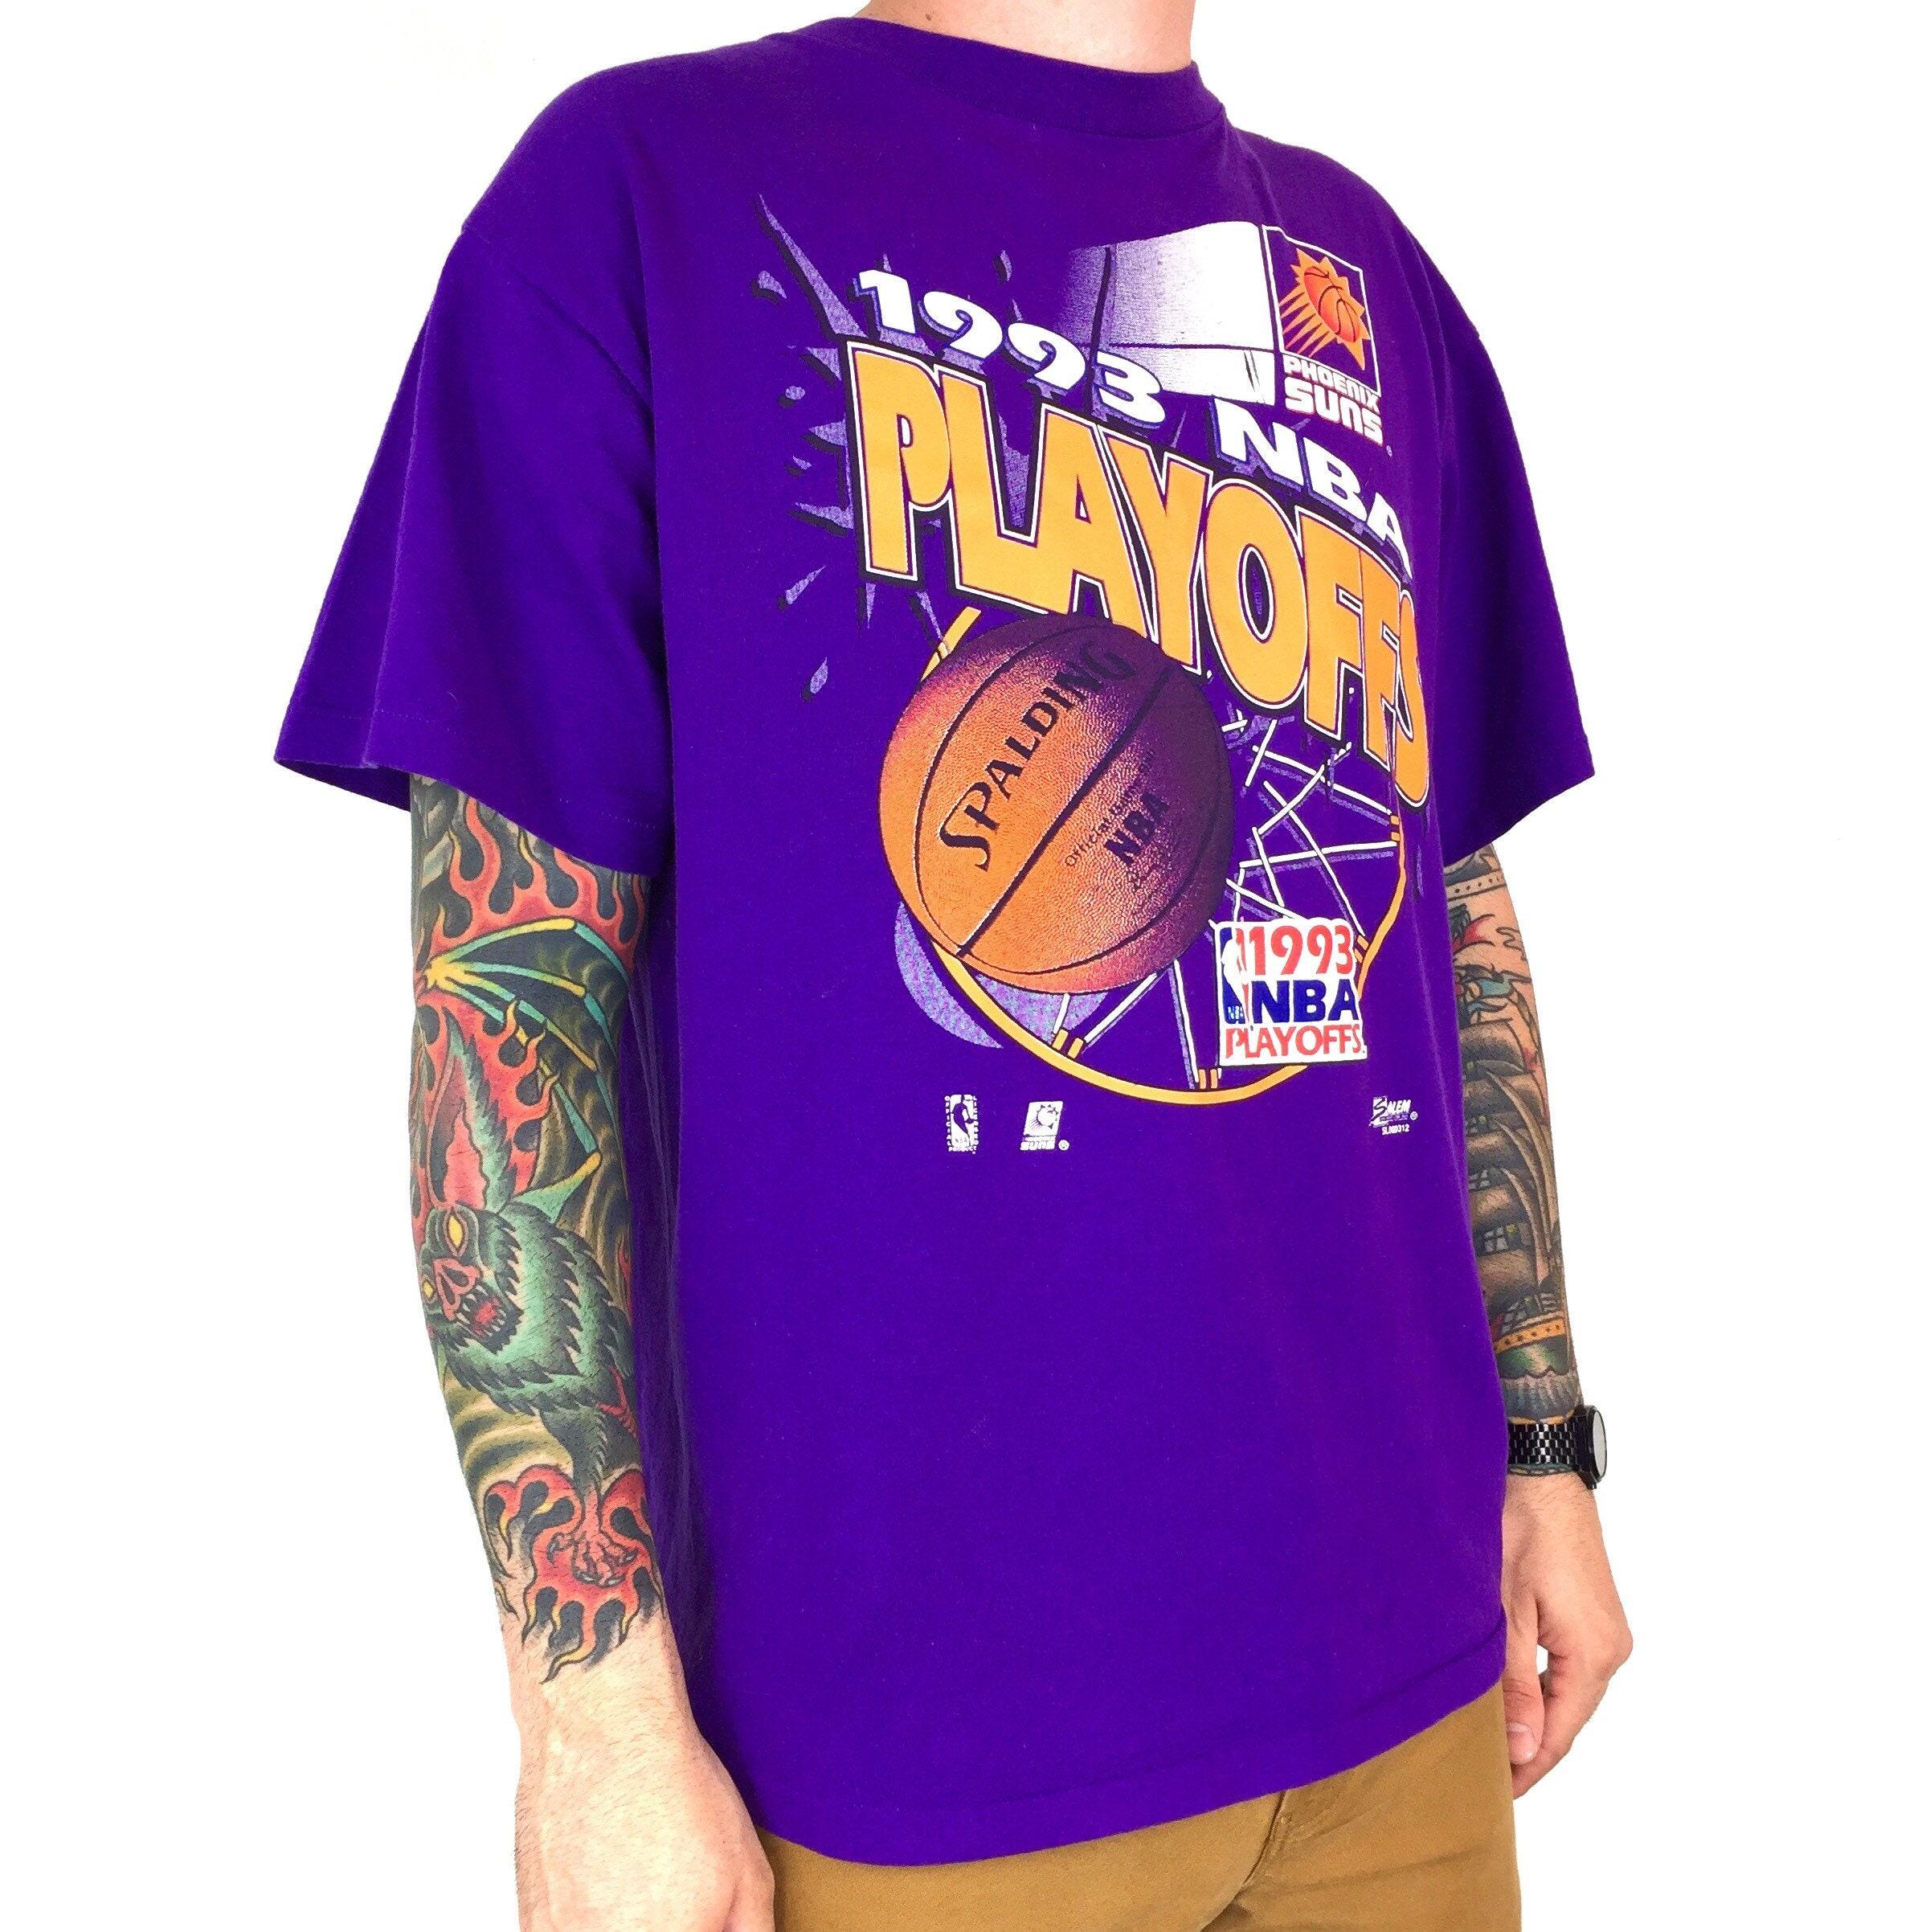 Vintage 90s 1993 93 Nba Phoenix Suns Playoffs Salem Sportswear Single Stitch Made In Usa Basketball Graphic Tee T-shirt Shirt - Size L-xl Unisex Tshirt